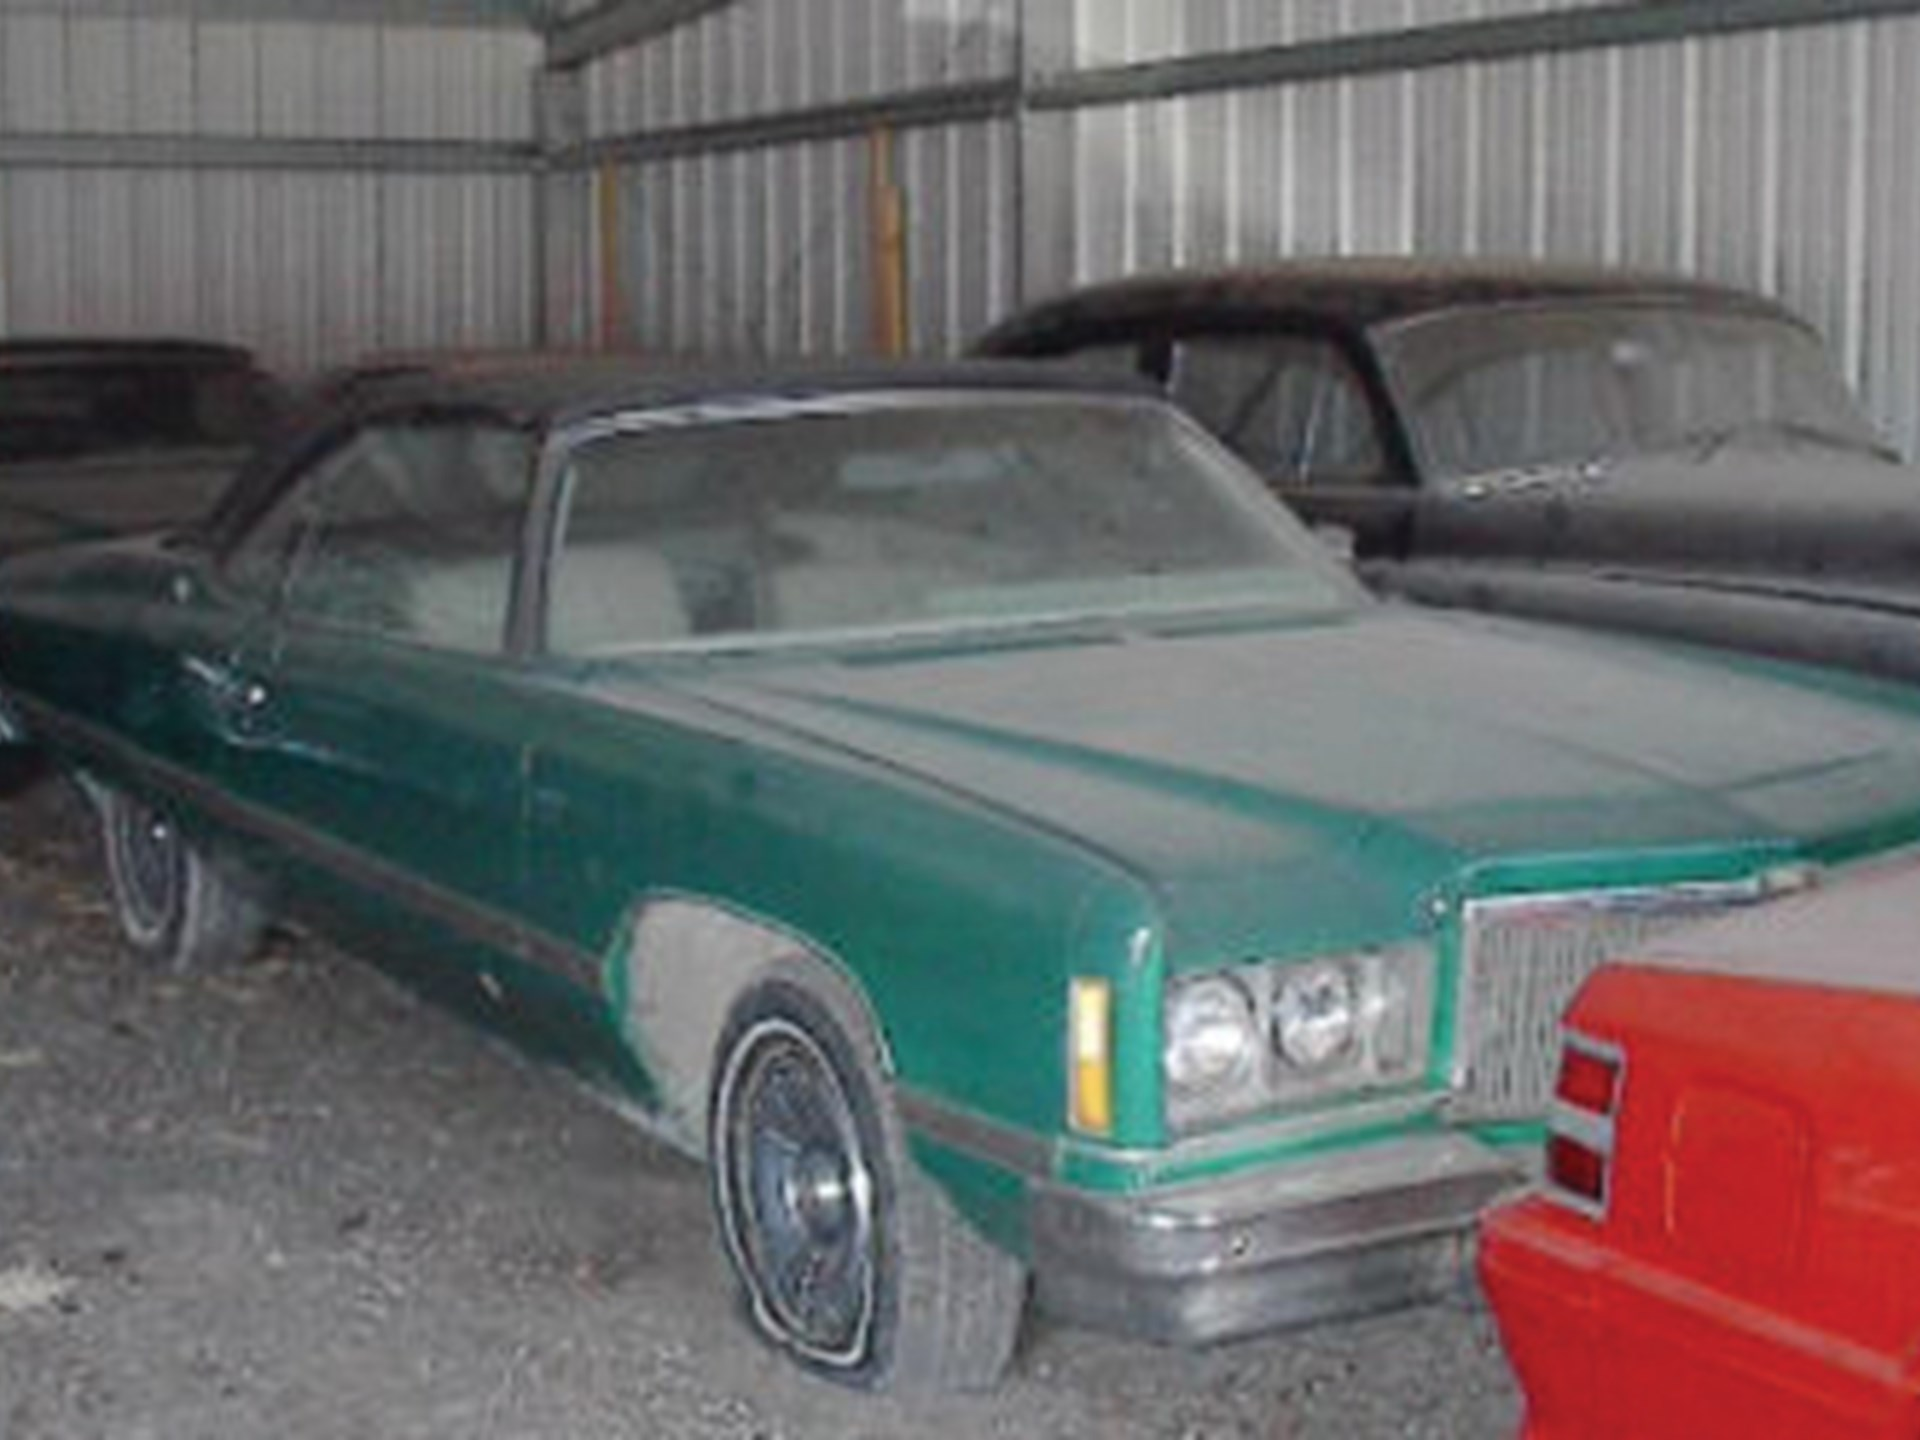 hight resolution of 1974 chevrolet impala convertible